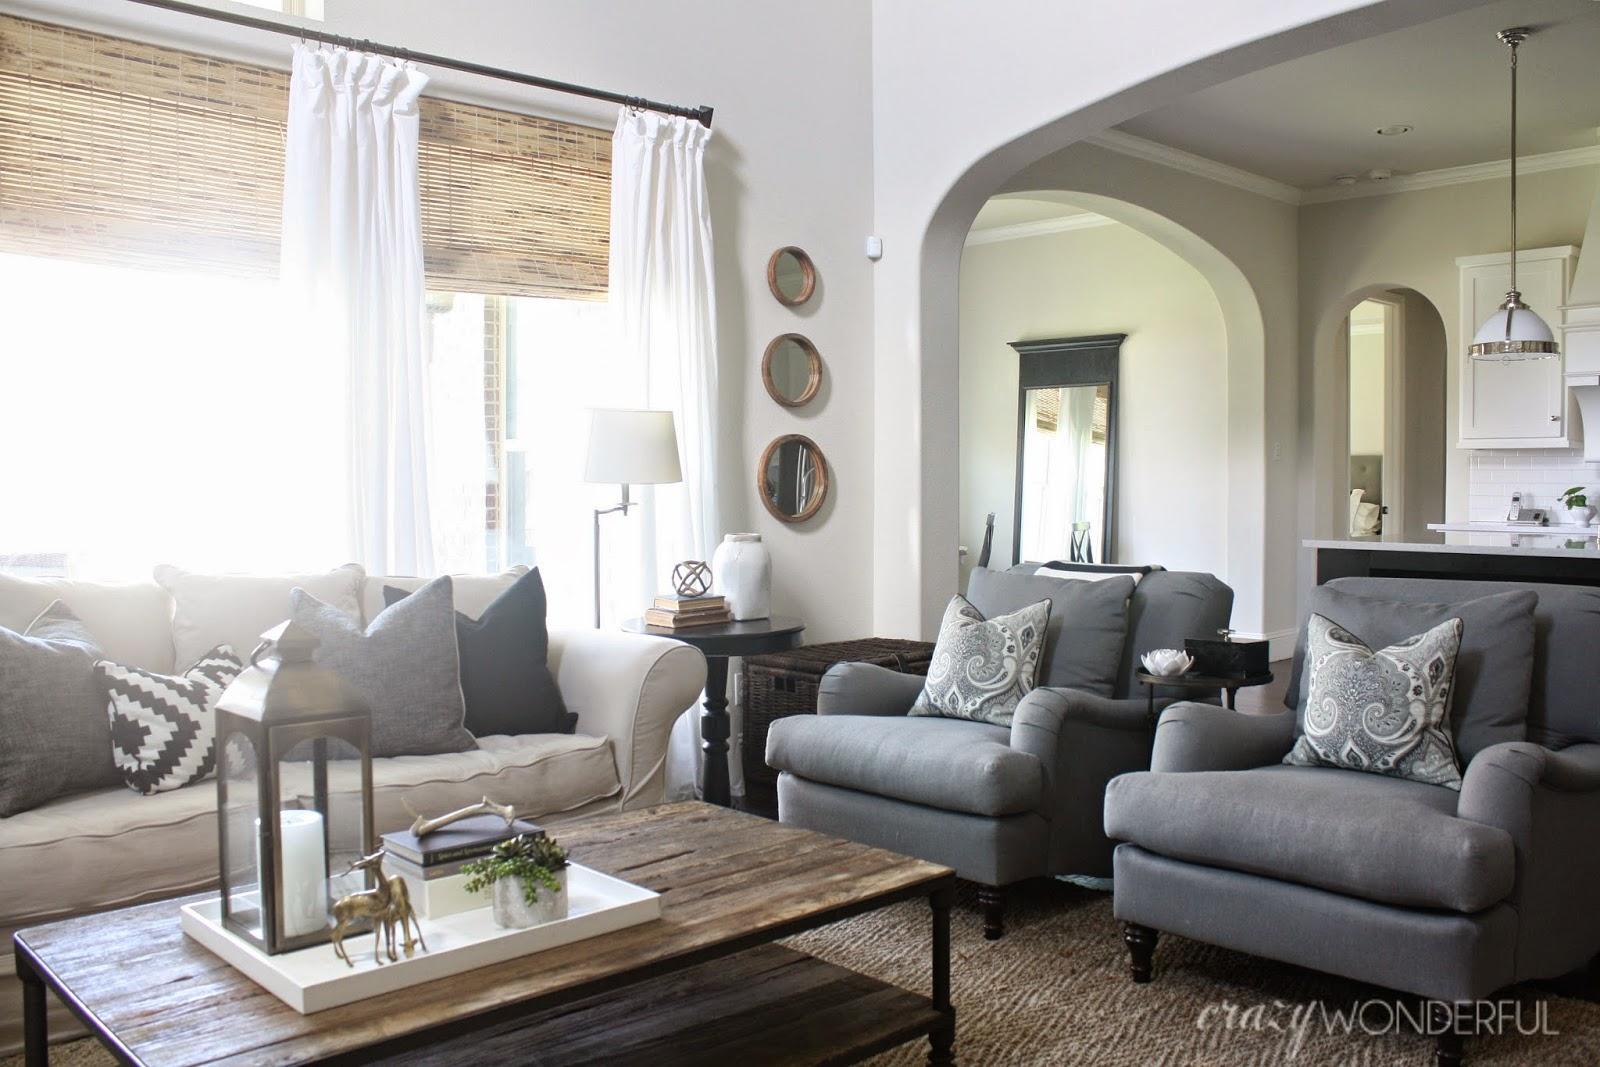 living room updates - Crazy Wonderful